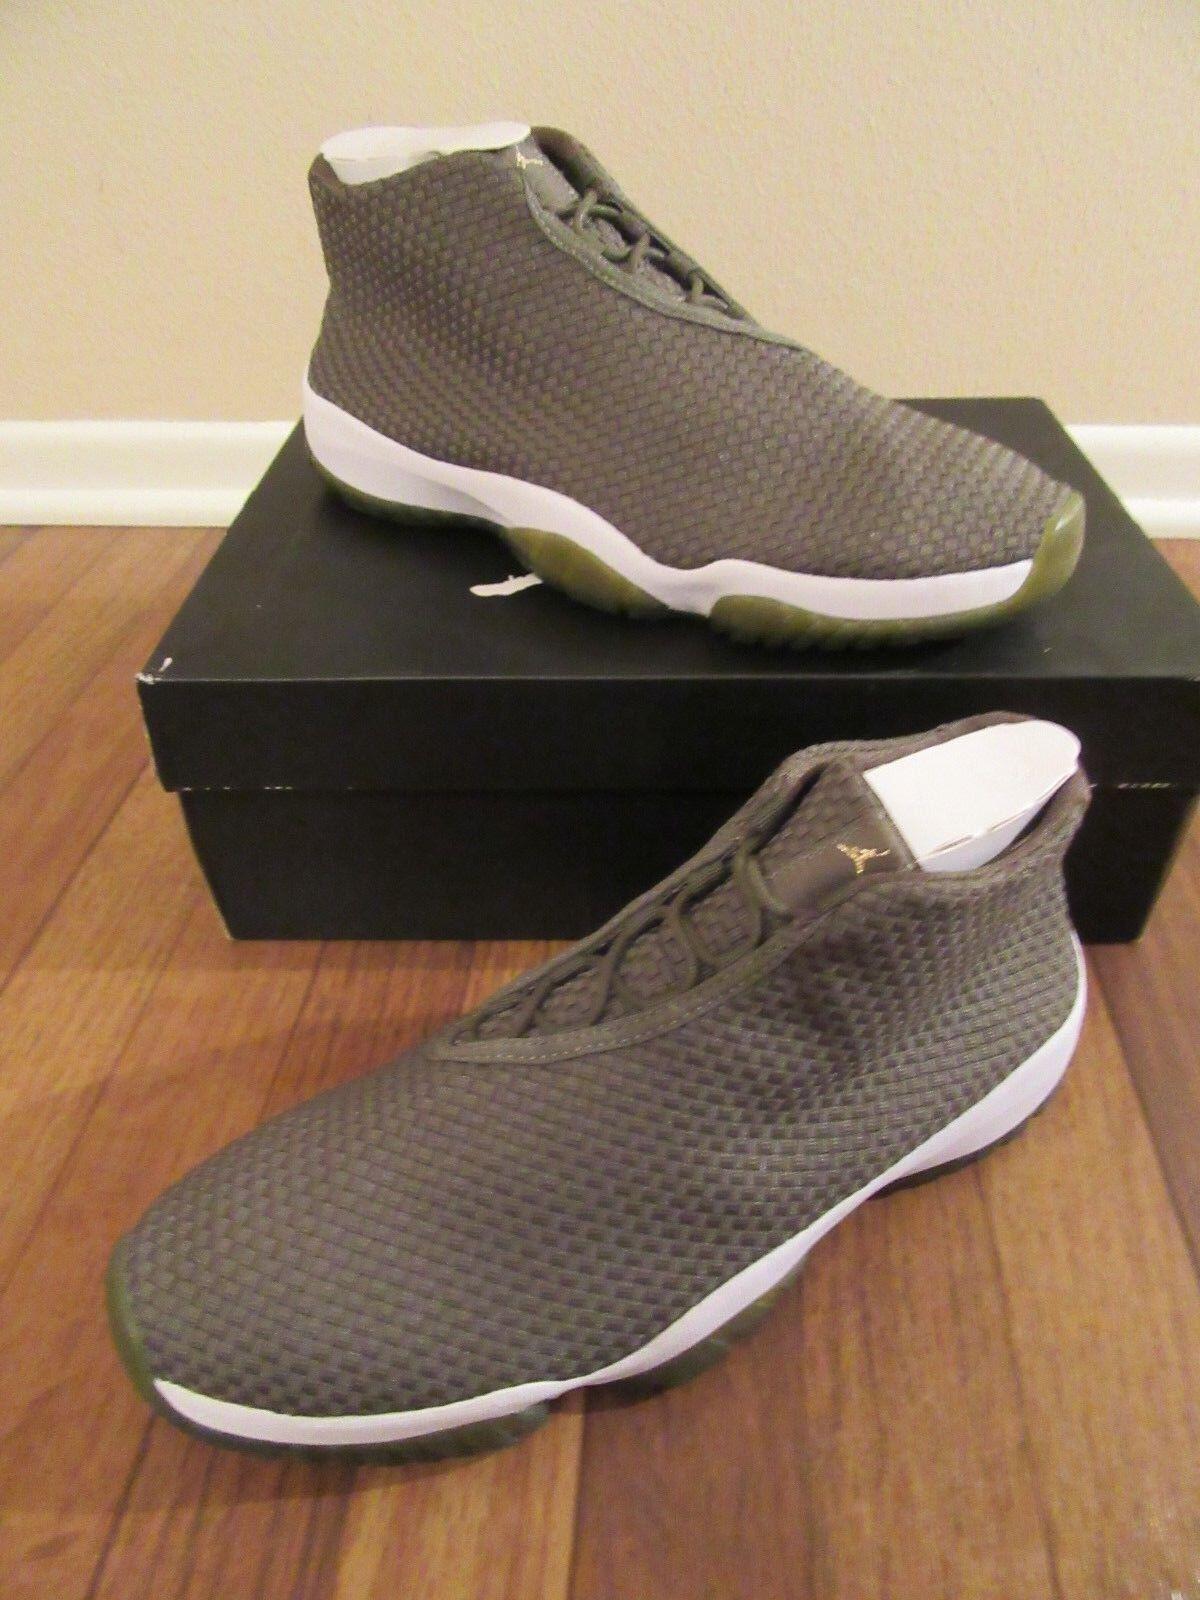 Nike air jordan, taglia 11 201 iguana iguana futuro bianco 656503 201 11 nuovo pennino ds c9469f